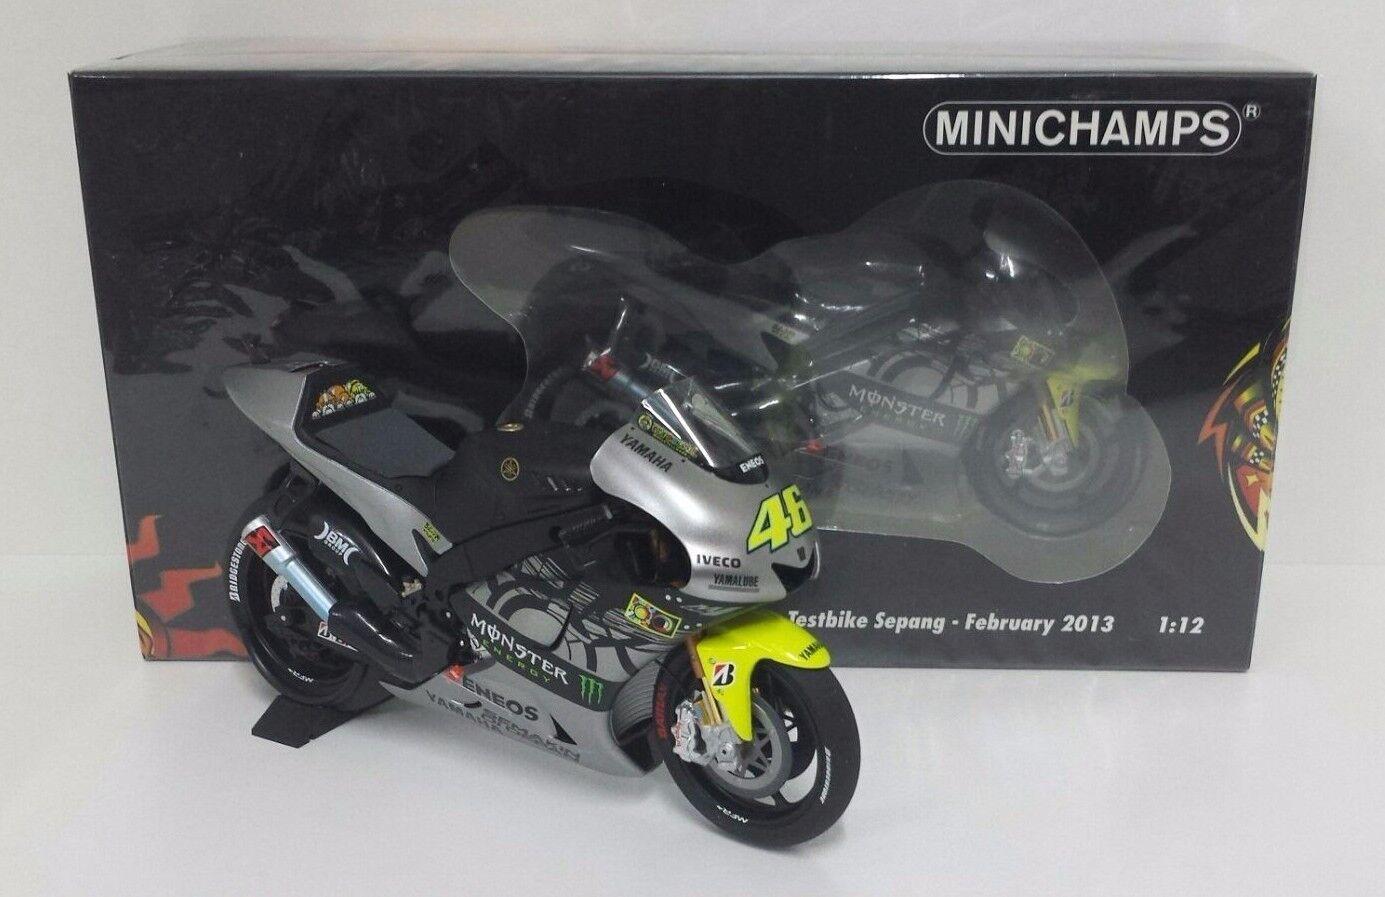 MINICHAMPS VALENTINO ROSSI 1 12 MODELLINO YAMAHA YZR M1 MOTOGP TEST SEPANG 2013